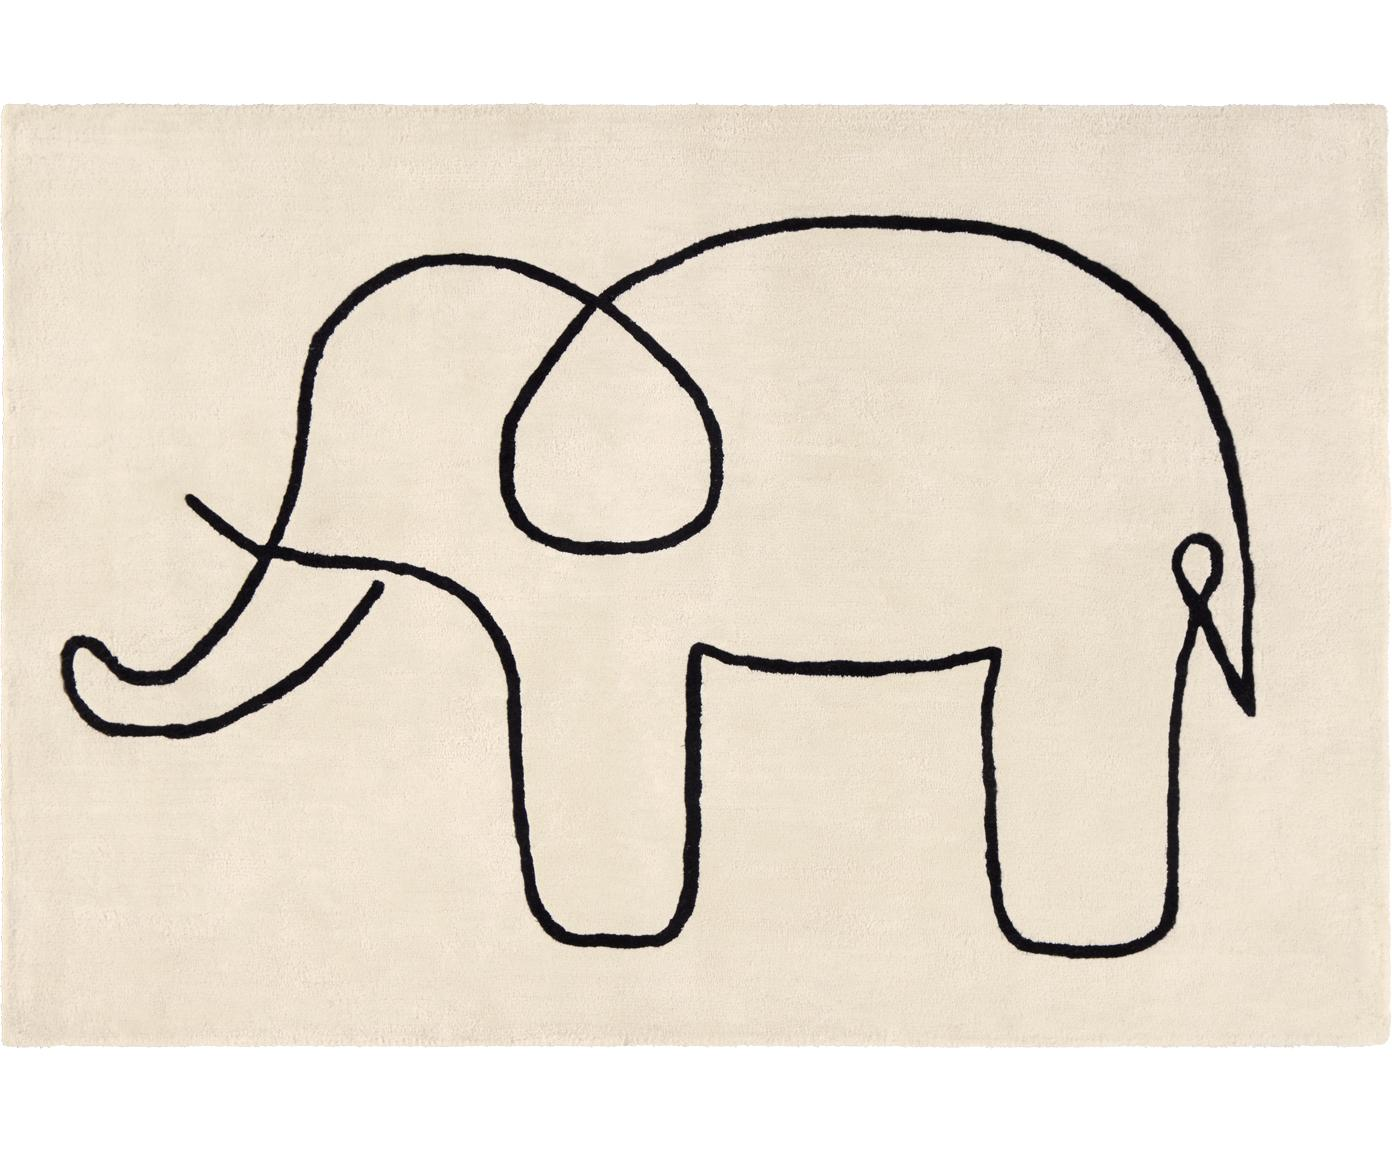 Teppich Sketchy Elephant, Viskose, Cremeweiß, Schwarz, 130 x 190 cm